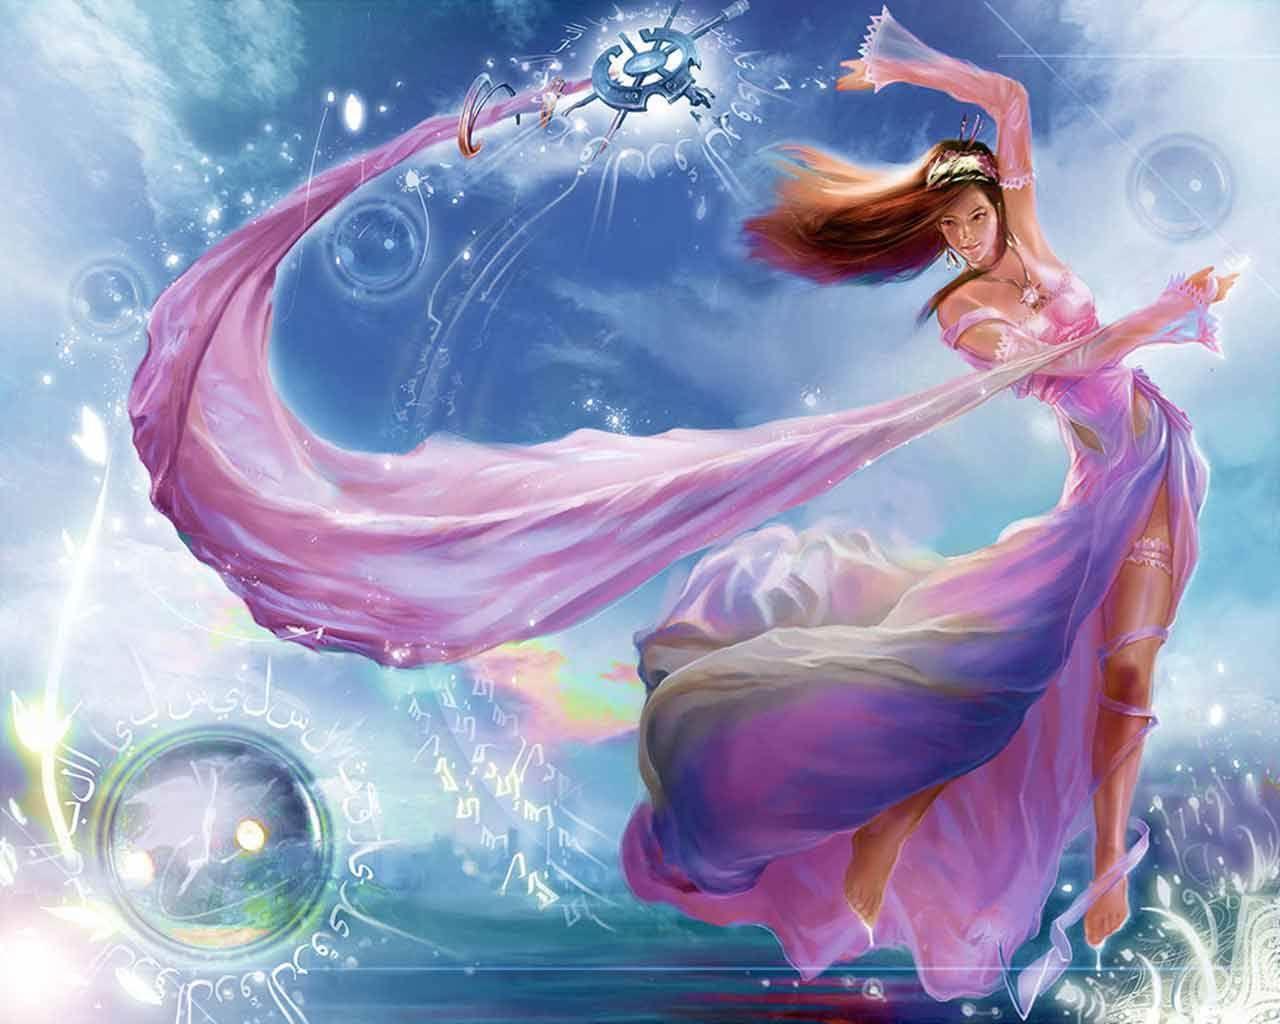 Beautiful fairies wallpapers 12801024 beautiful fairy wallpapers beautiful fairies wallpapers 12801024 beautiful fairy wallpapers adorable wallpapers thecheapjerseys Images